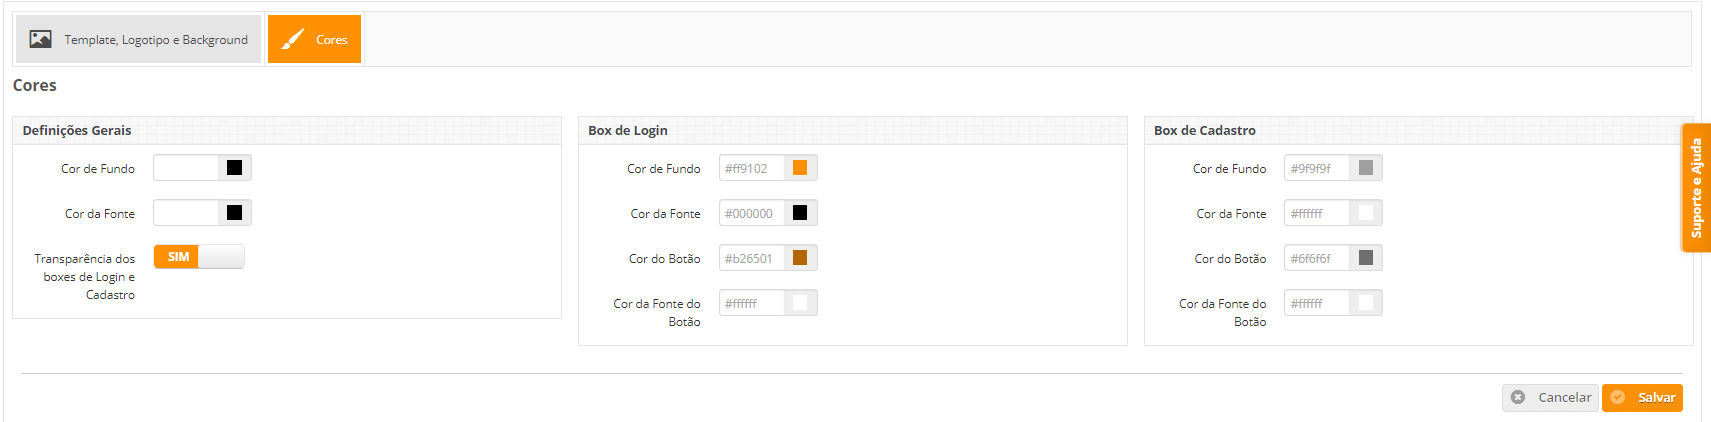 hotspot personalizado cores